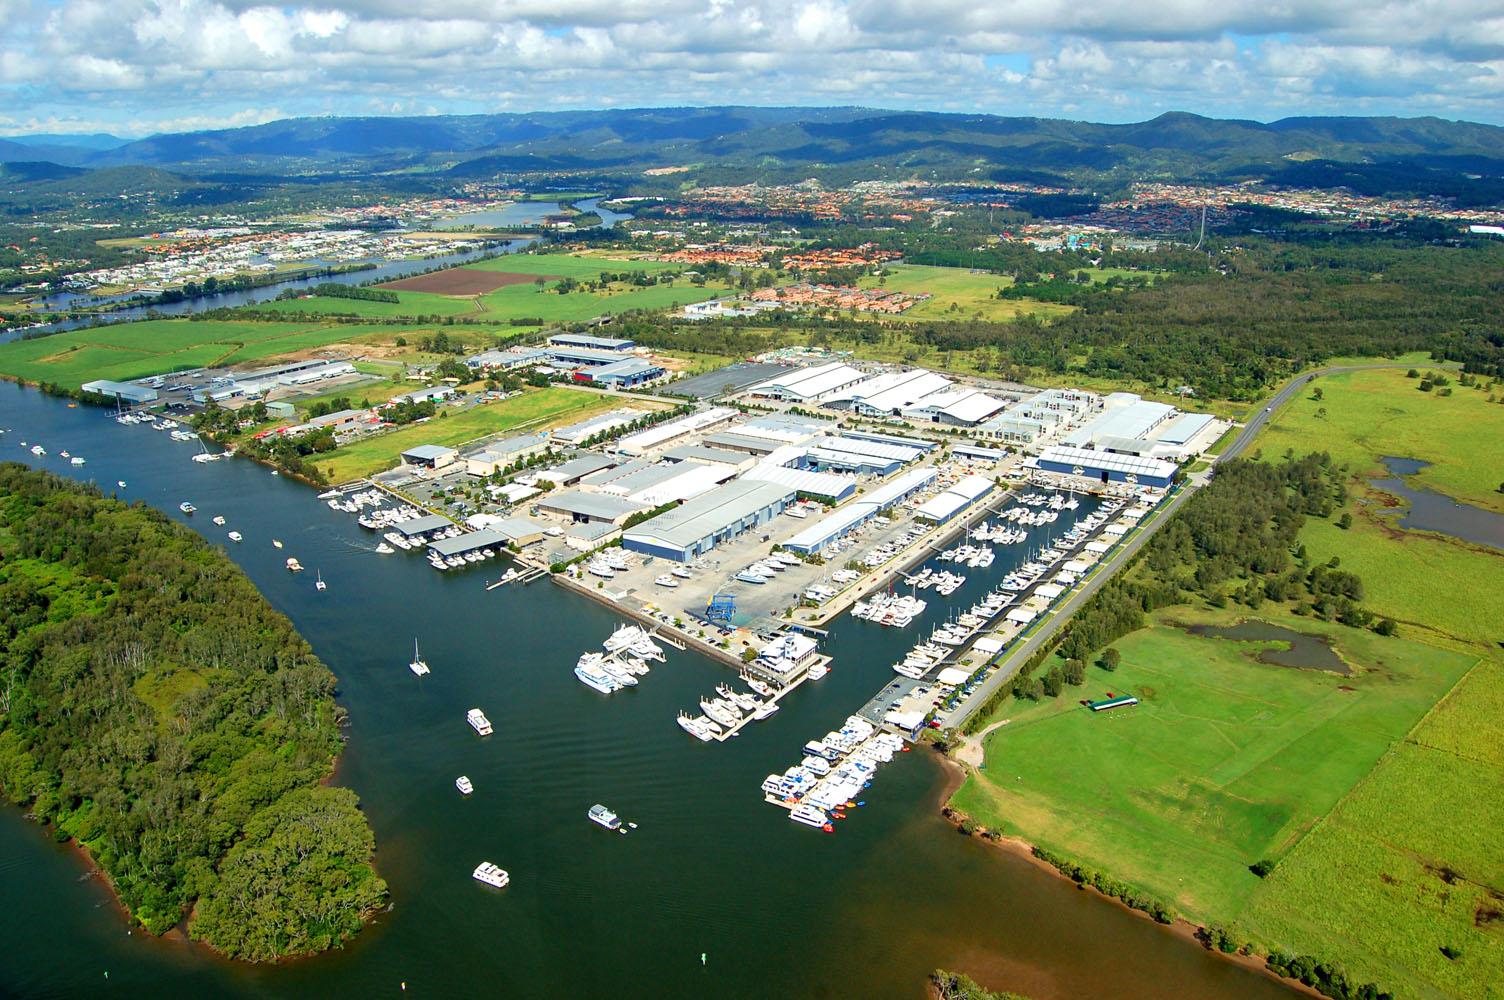 Gold Coast City Marina on prime land in the Coomera marine precinct